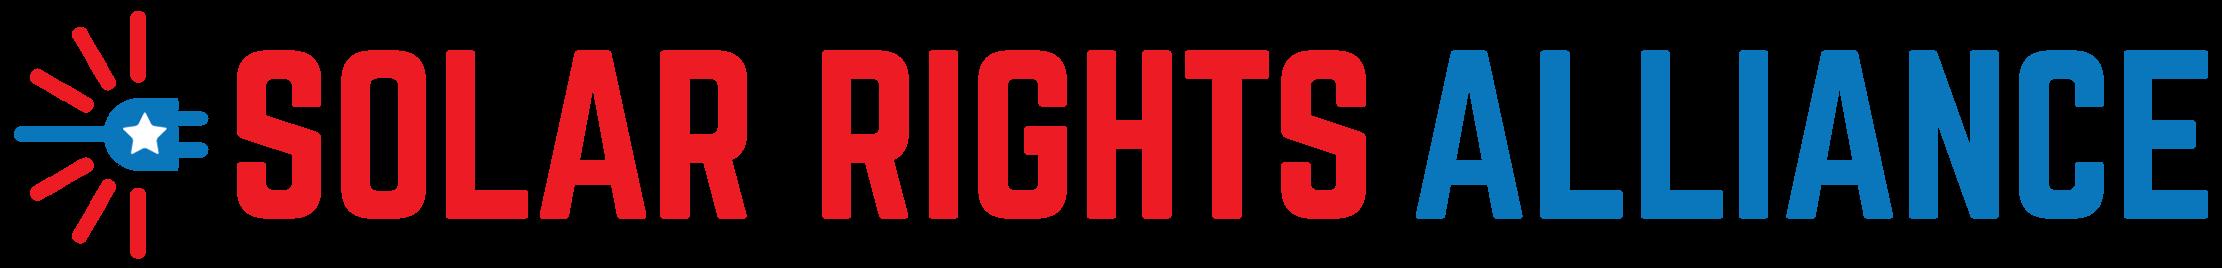 Solar Rights Alliance